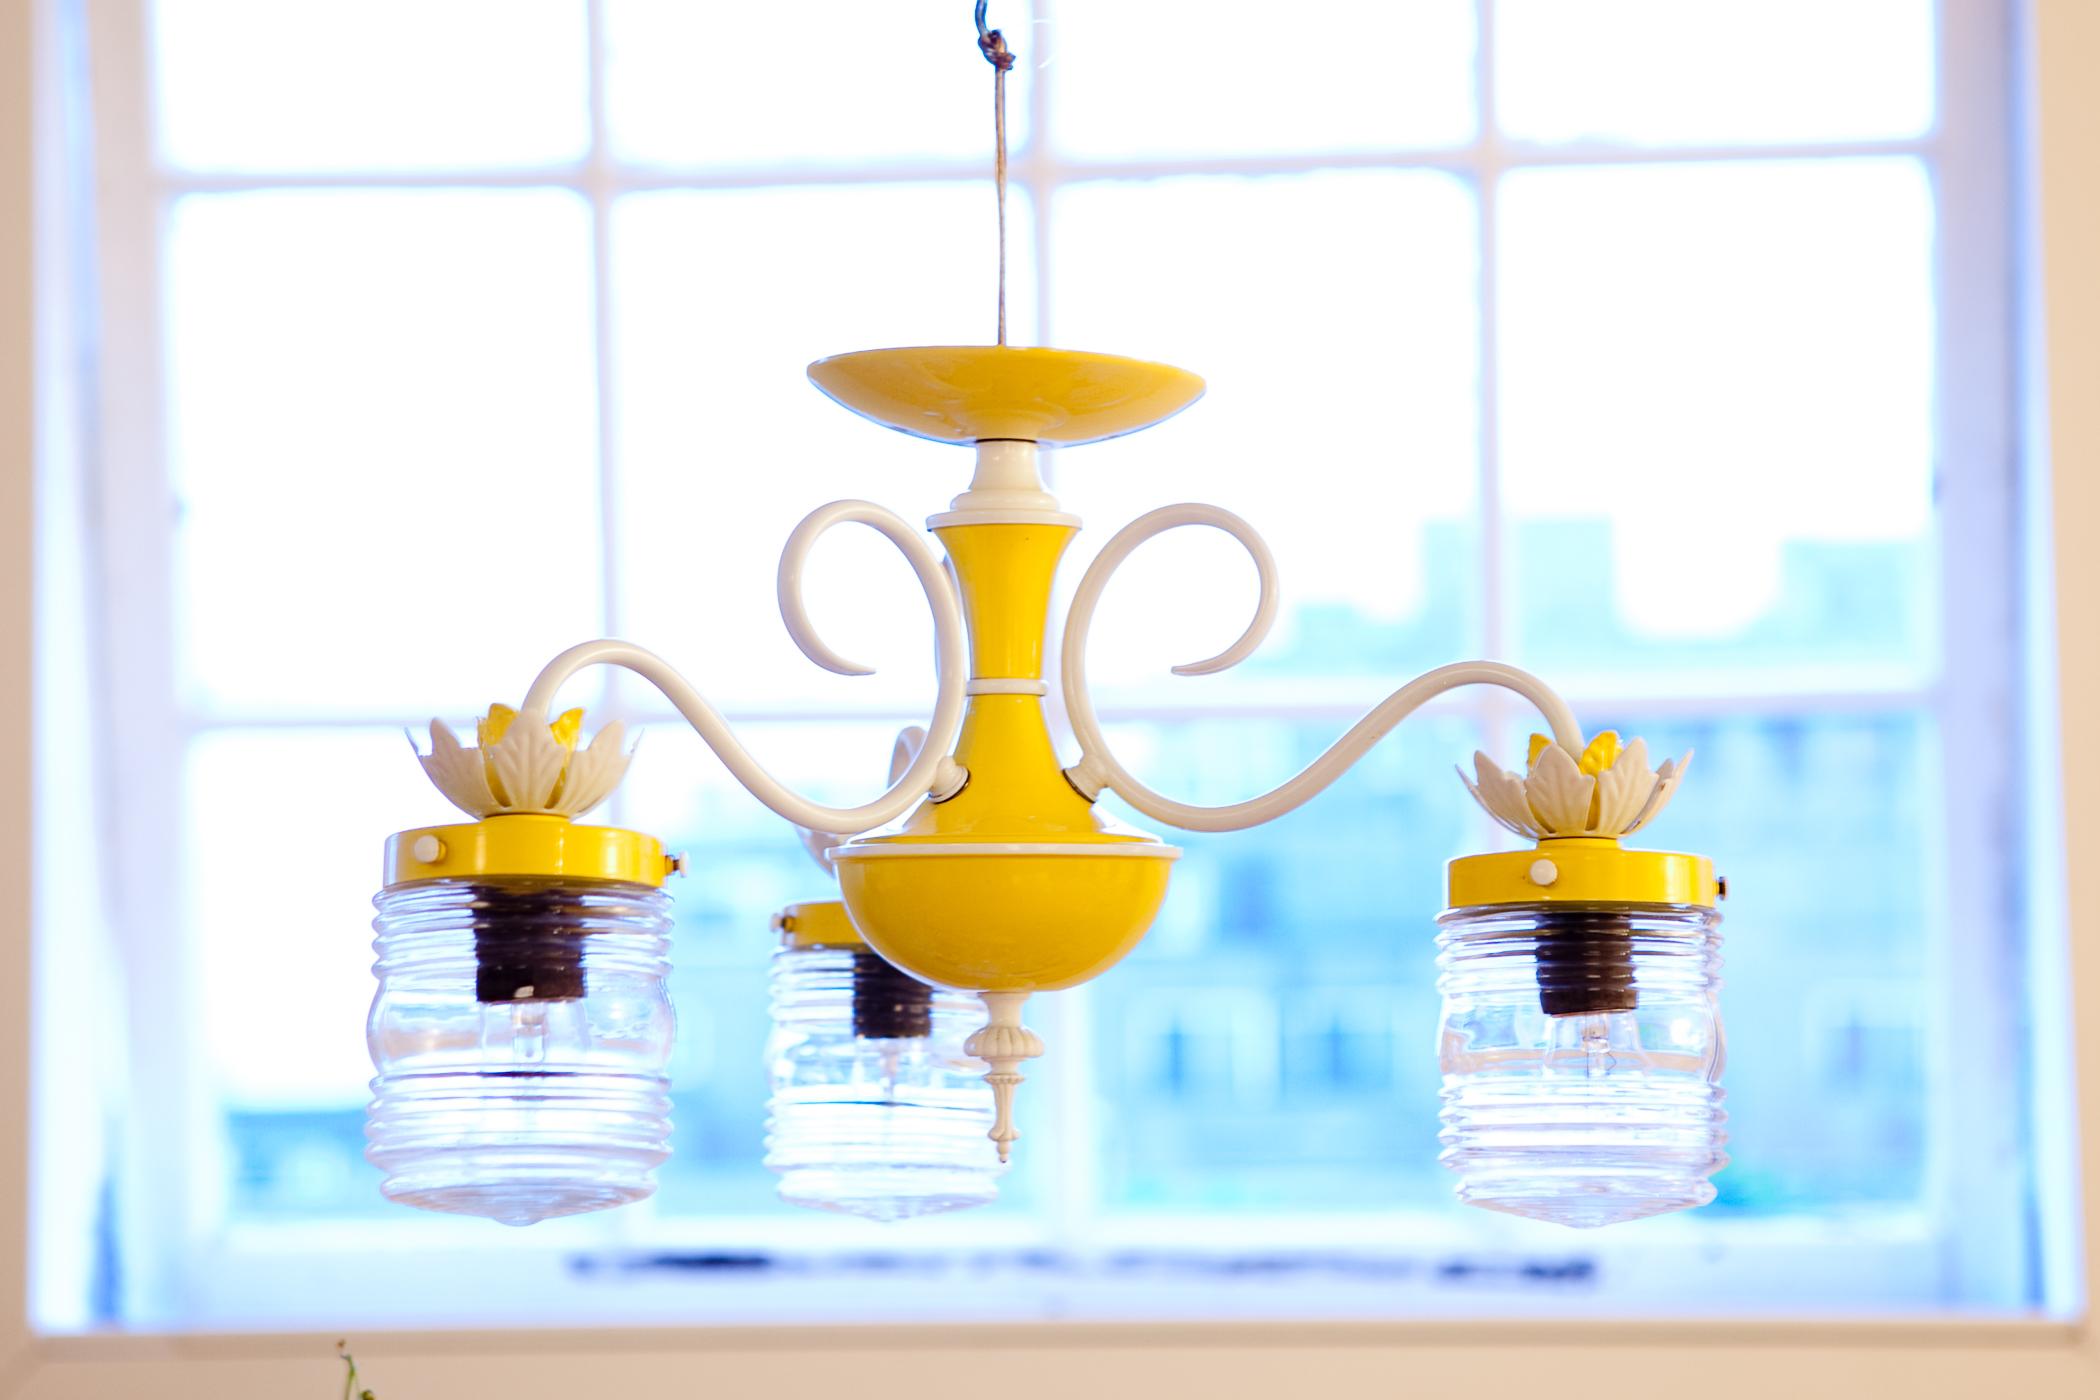 Yellow chandelier craftbnb friday finda yellow chandelier bow tie bustlethe blog aloadofball Gallery